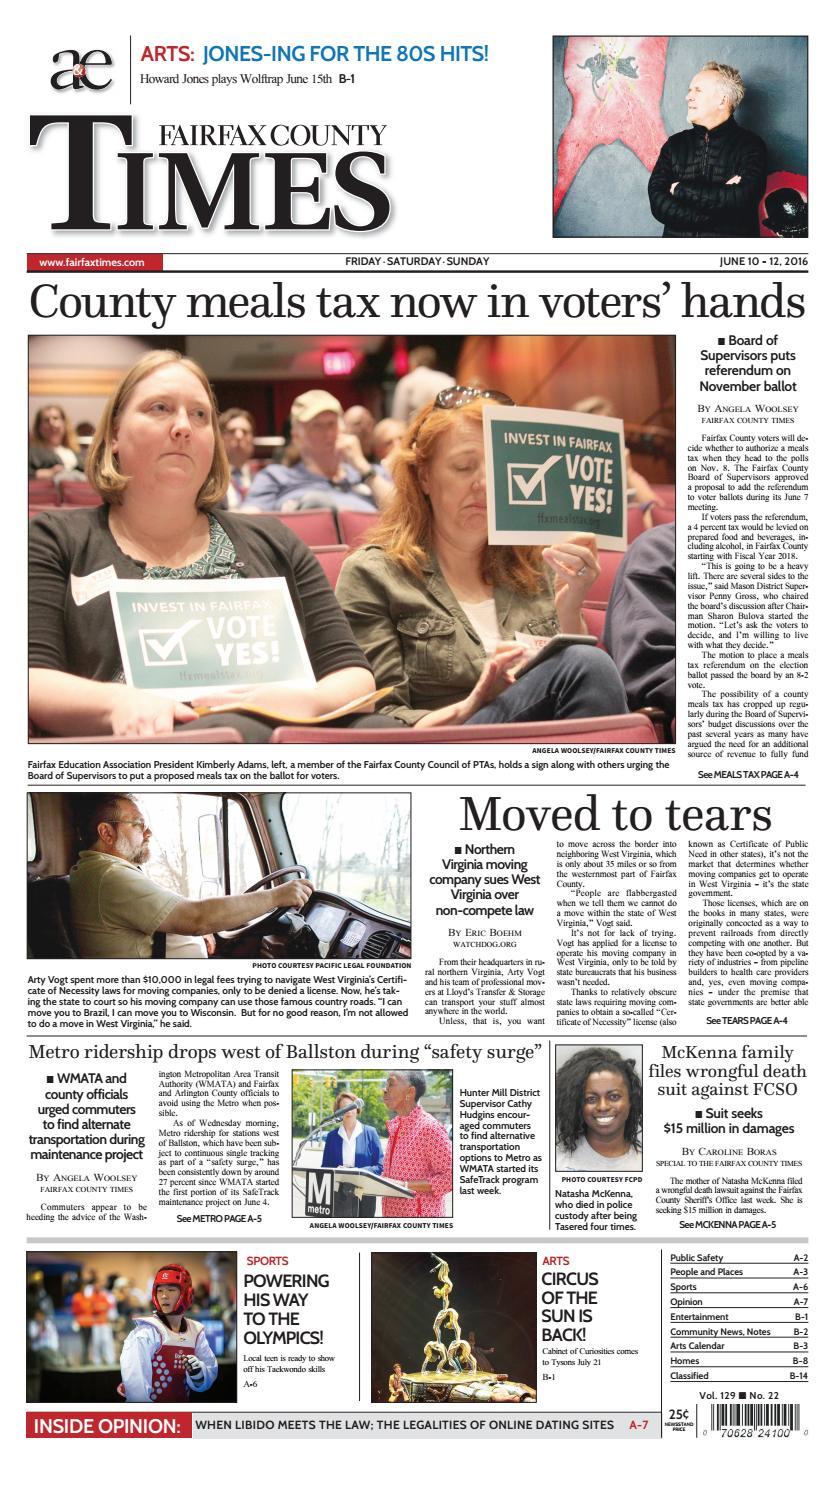 Fairfax County Times 06.10.16 by The Fairfax Times - Issuu